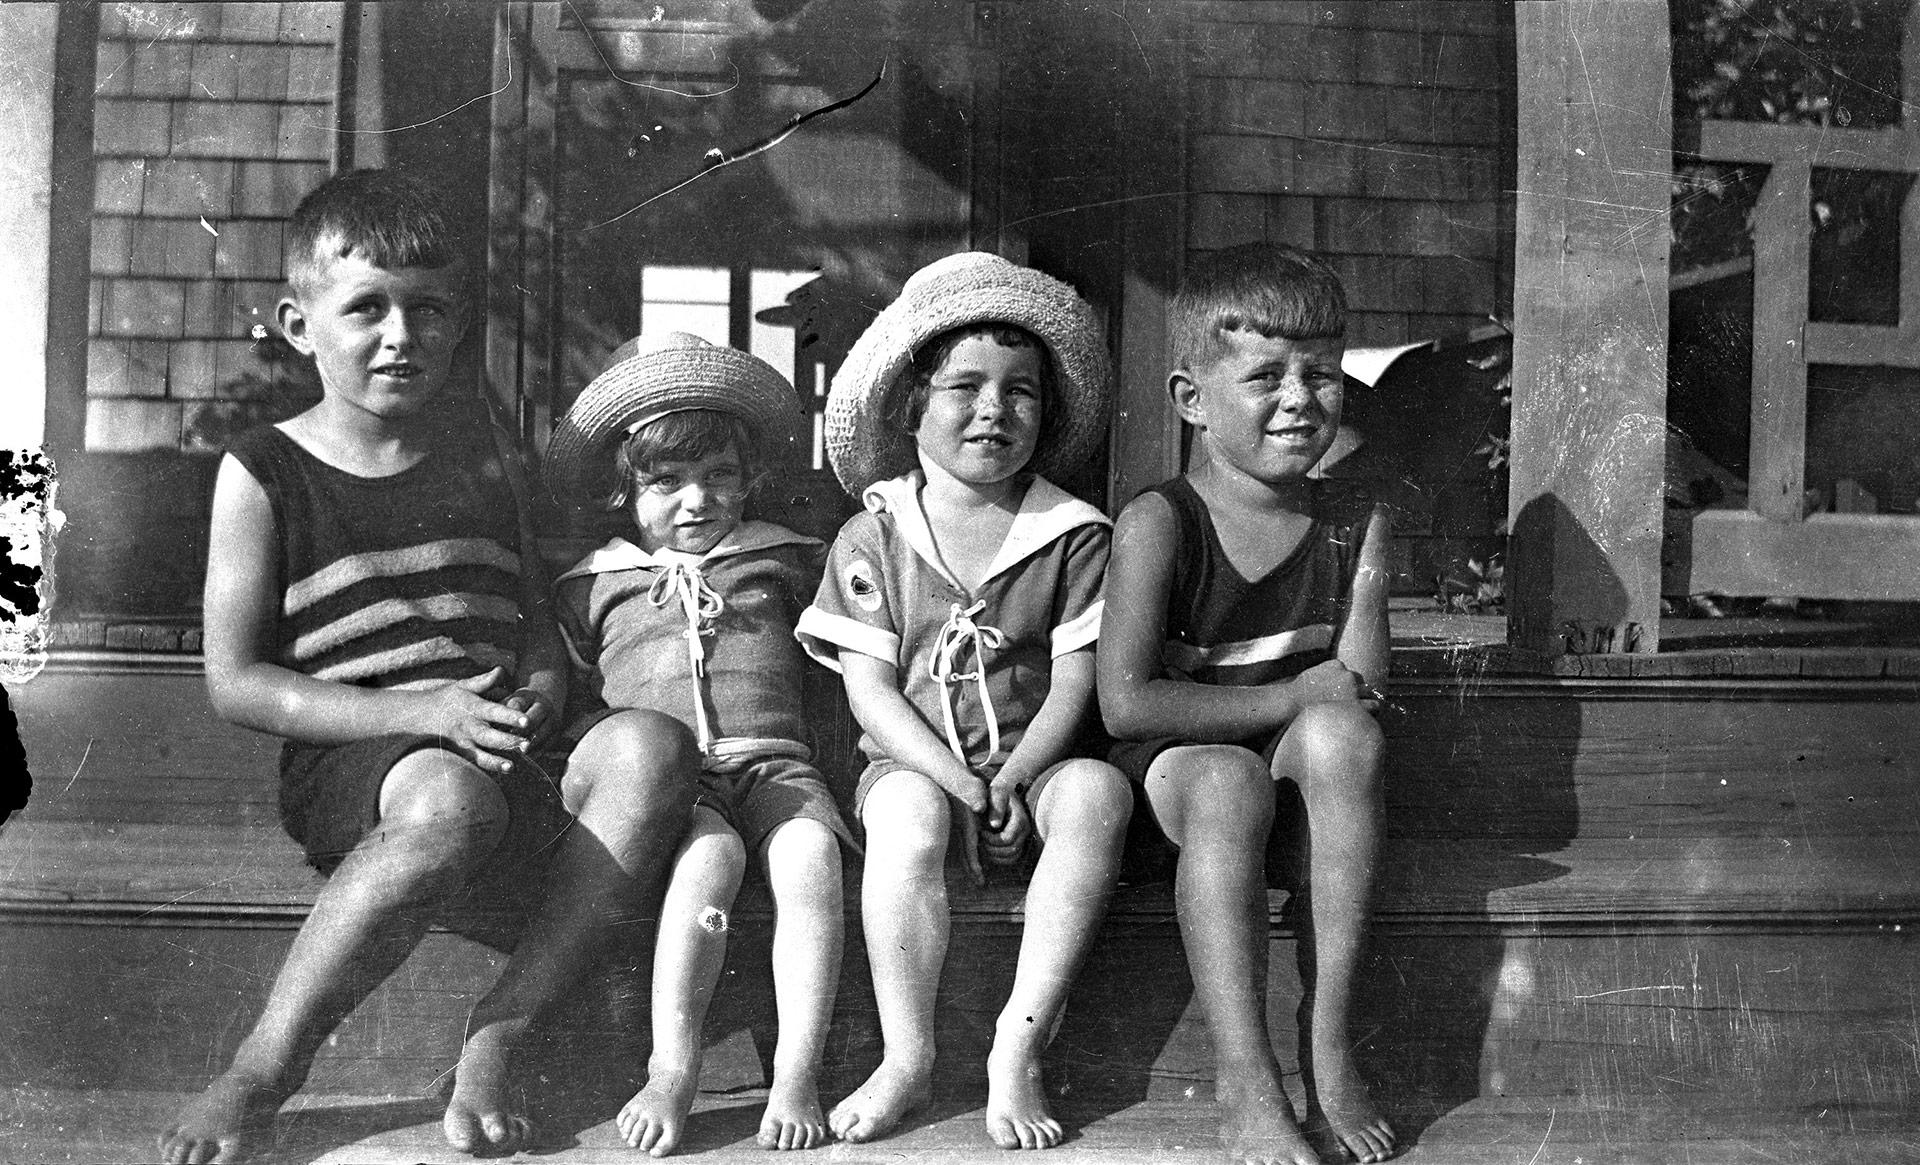 Cuatro de los hermanos Kennedy en Massachusetts 1928:Joseph Jr., Kathleen, Rosemary y John Fitzgerald, futuro presidente (Reuters)